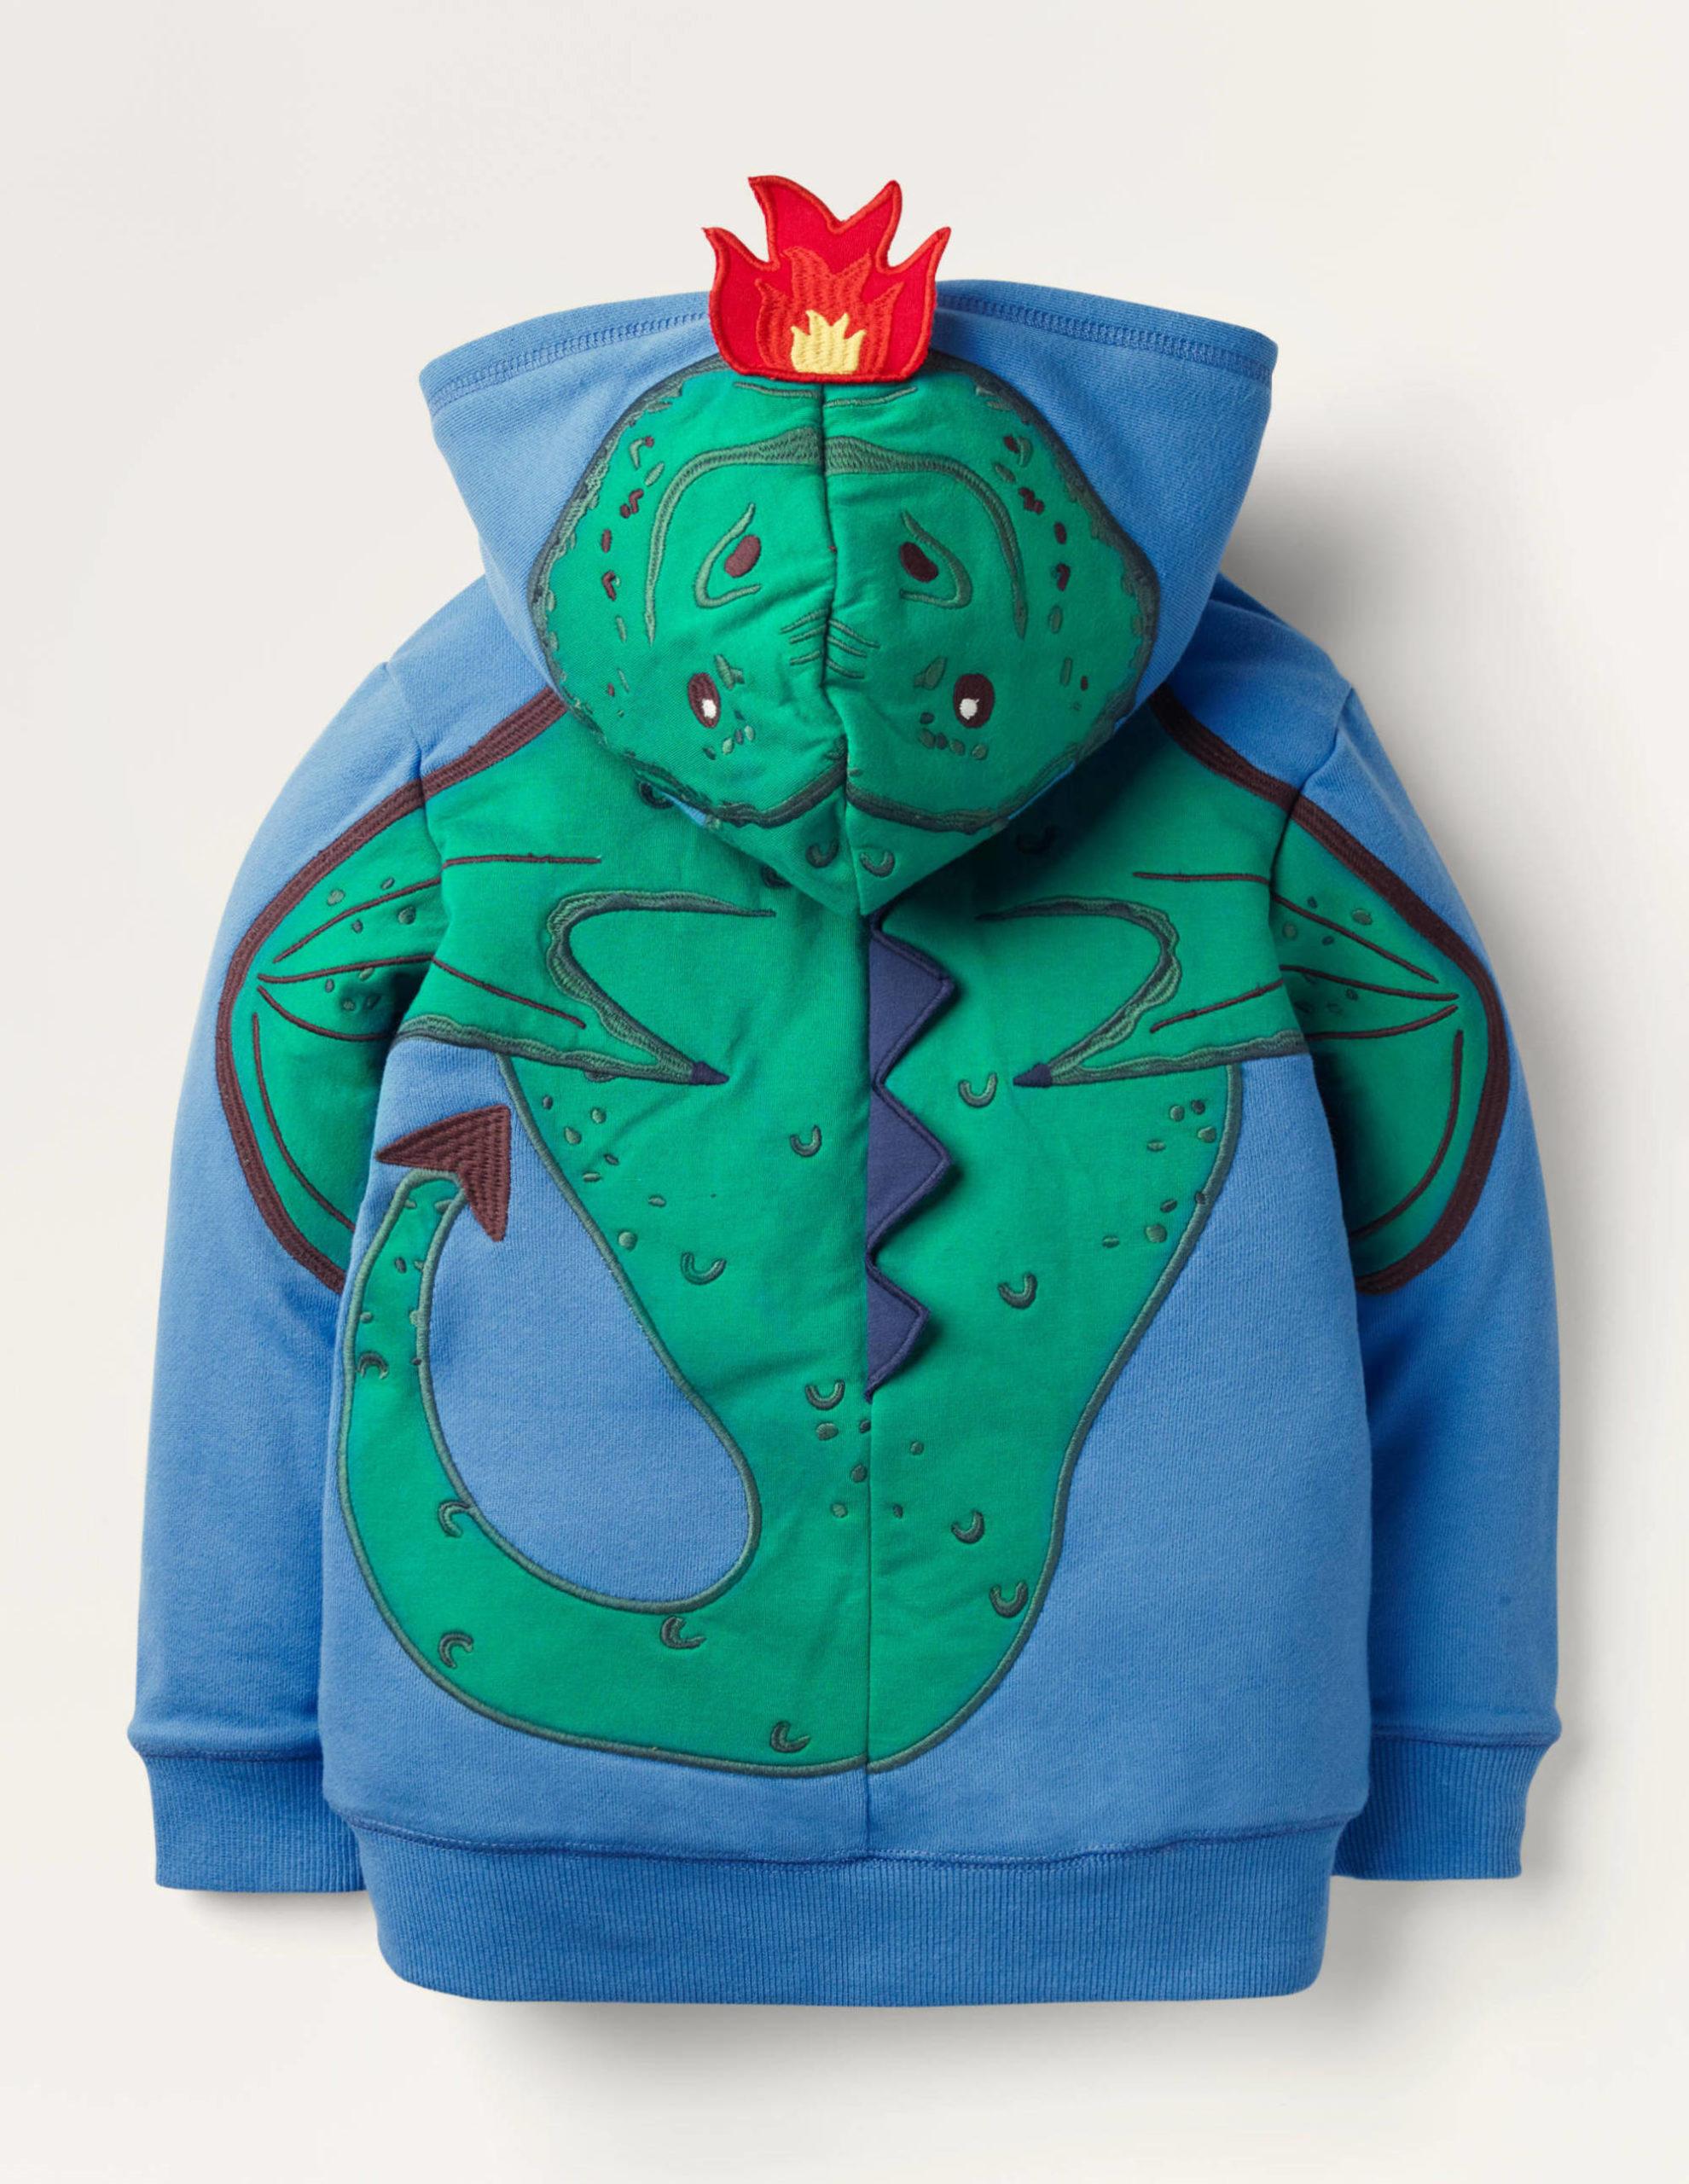 Shaggy-Lined Appliqué Hoodie - Elizabethan Blue Dragon